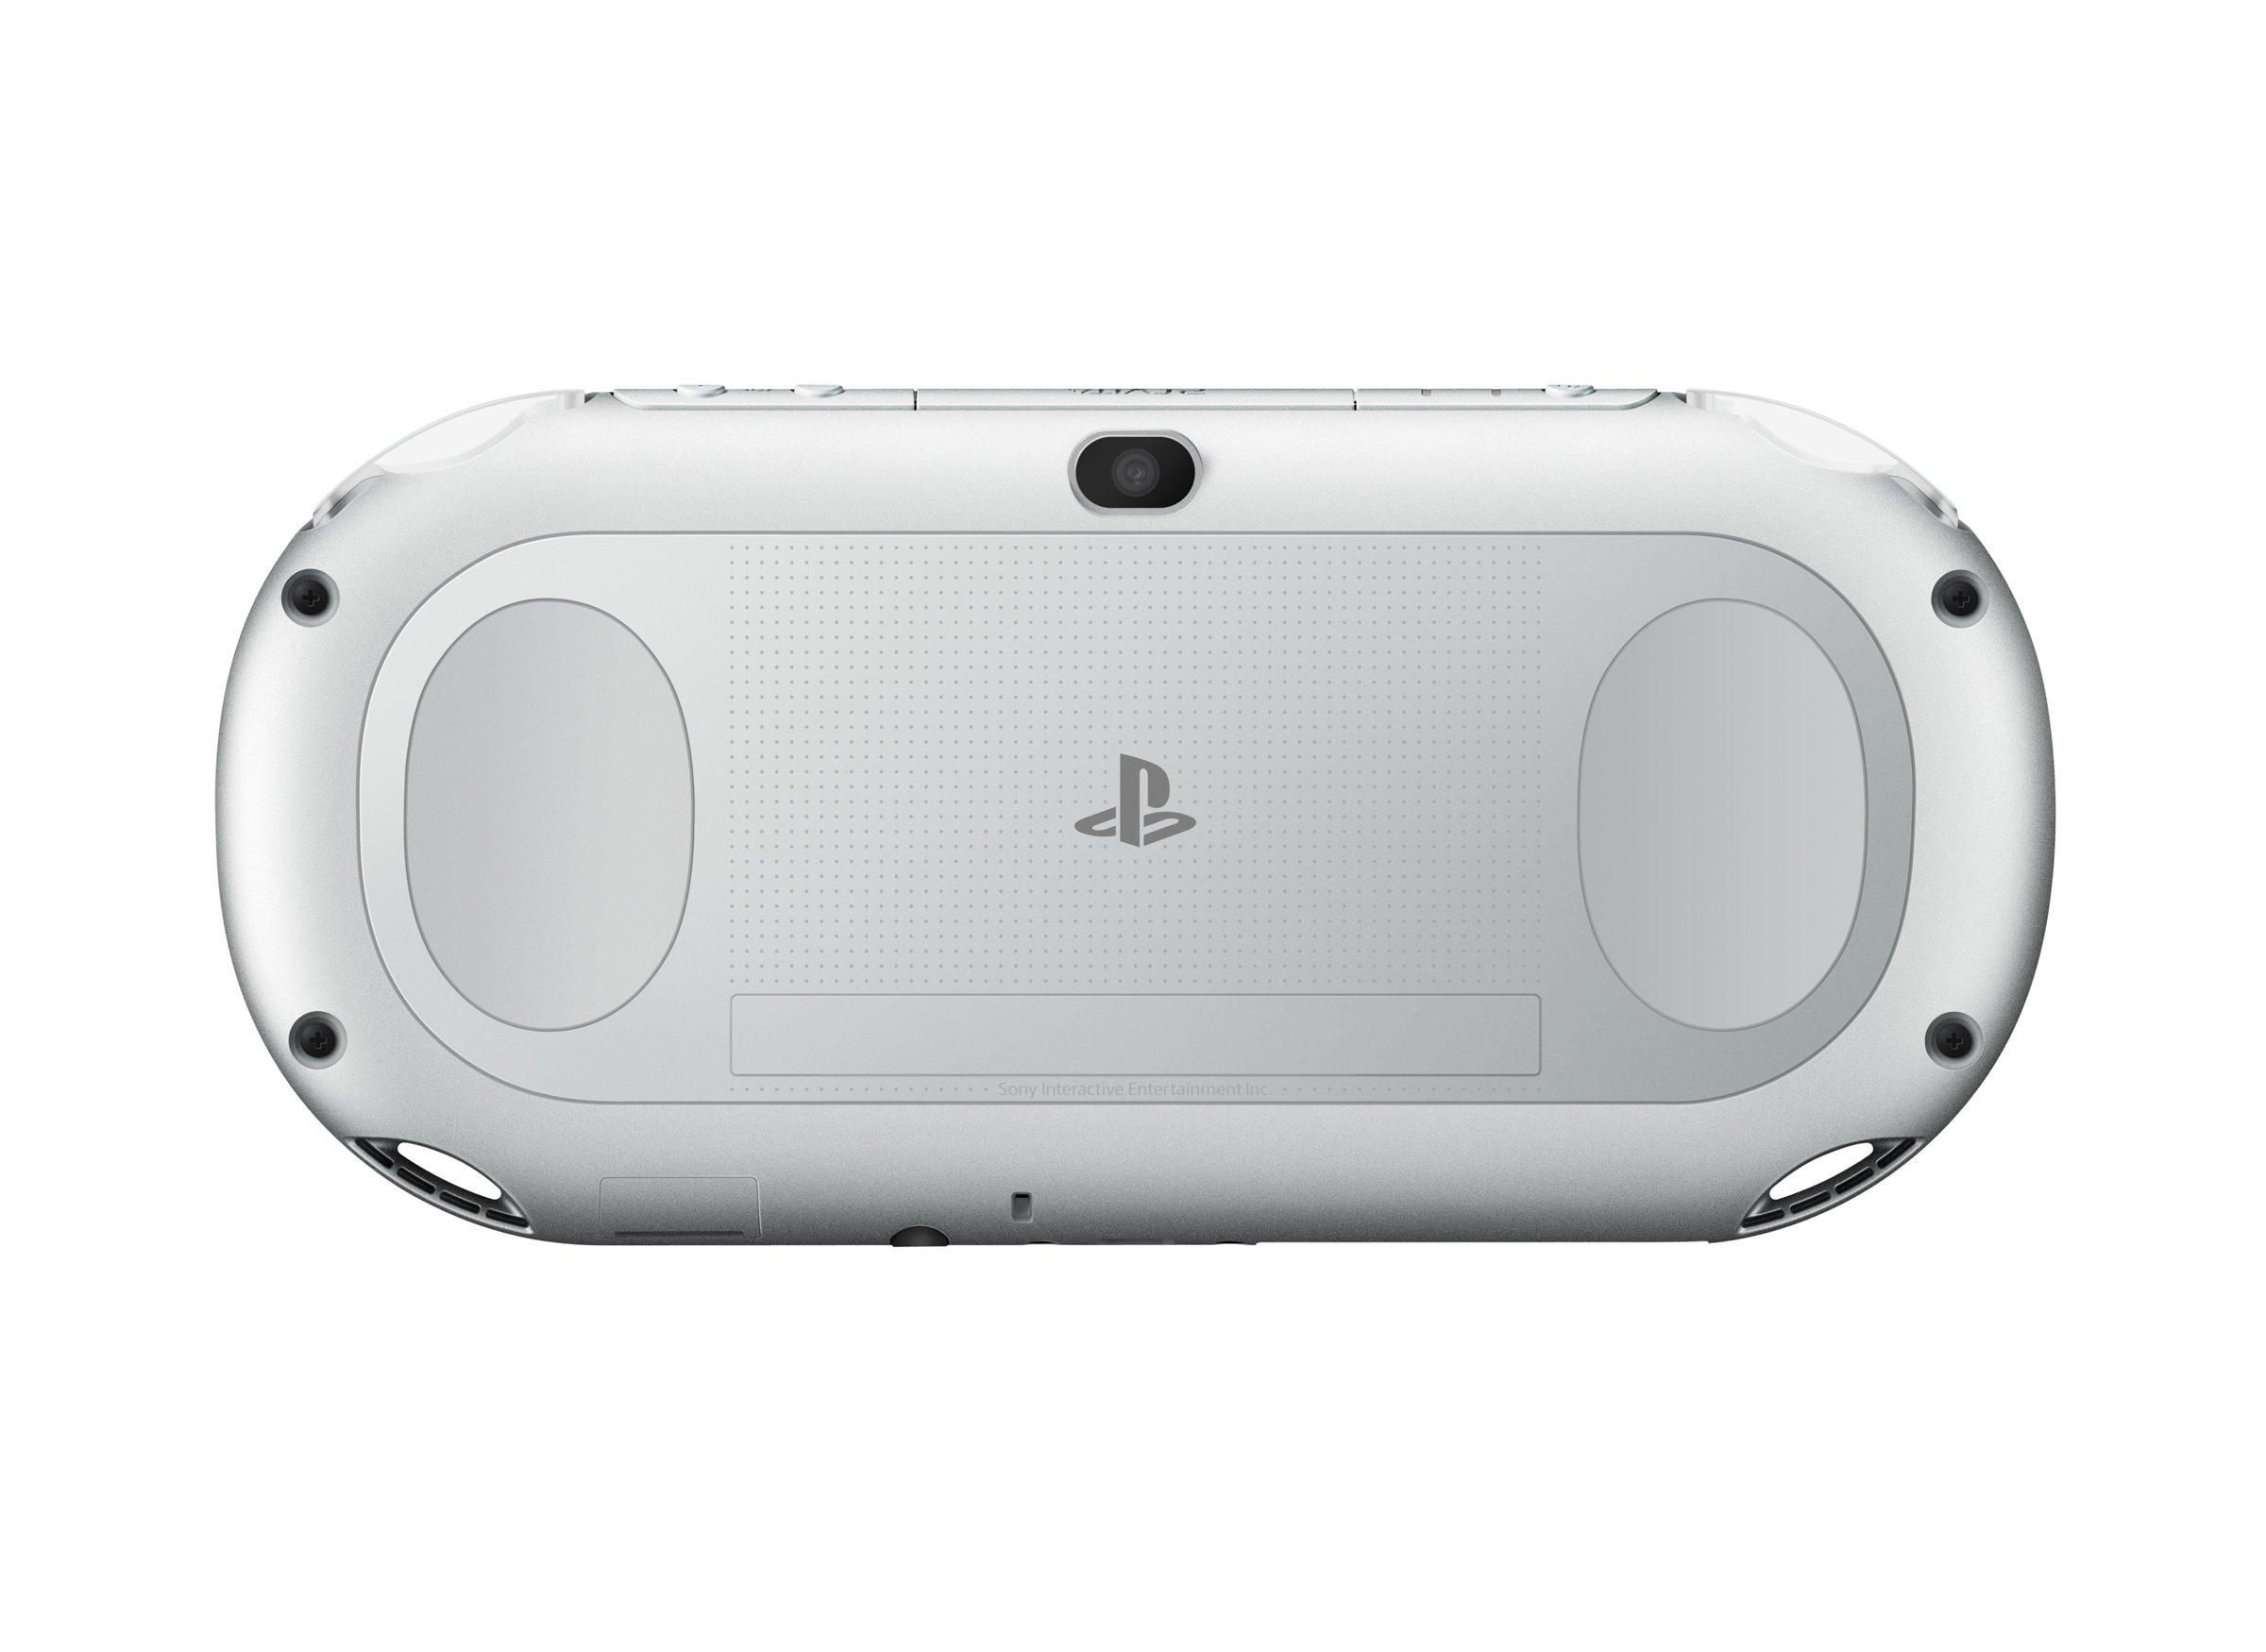 PlayStation Vita Wi-Fi Silver PCH-2000 ZA25 by PlayStation Vita (Image #8)